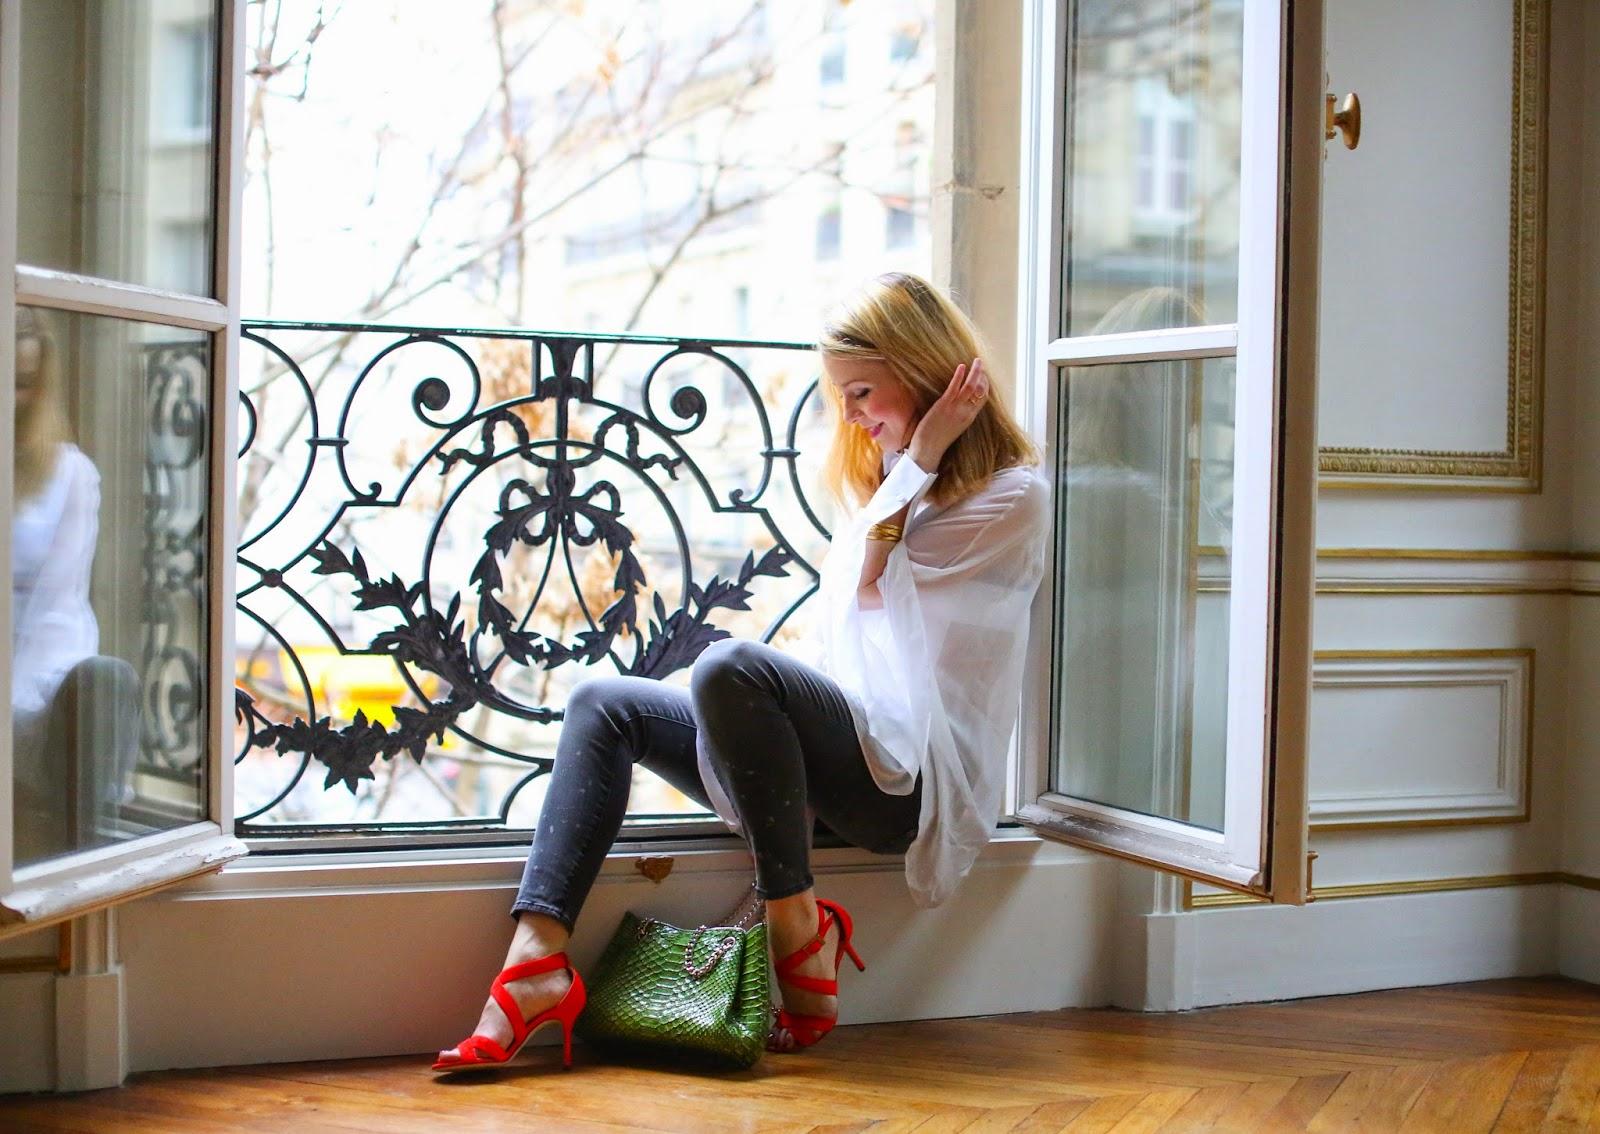 jimmy choo, valentino, paris, fashion blogger, hudson jeans